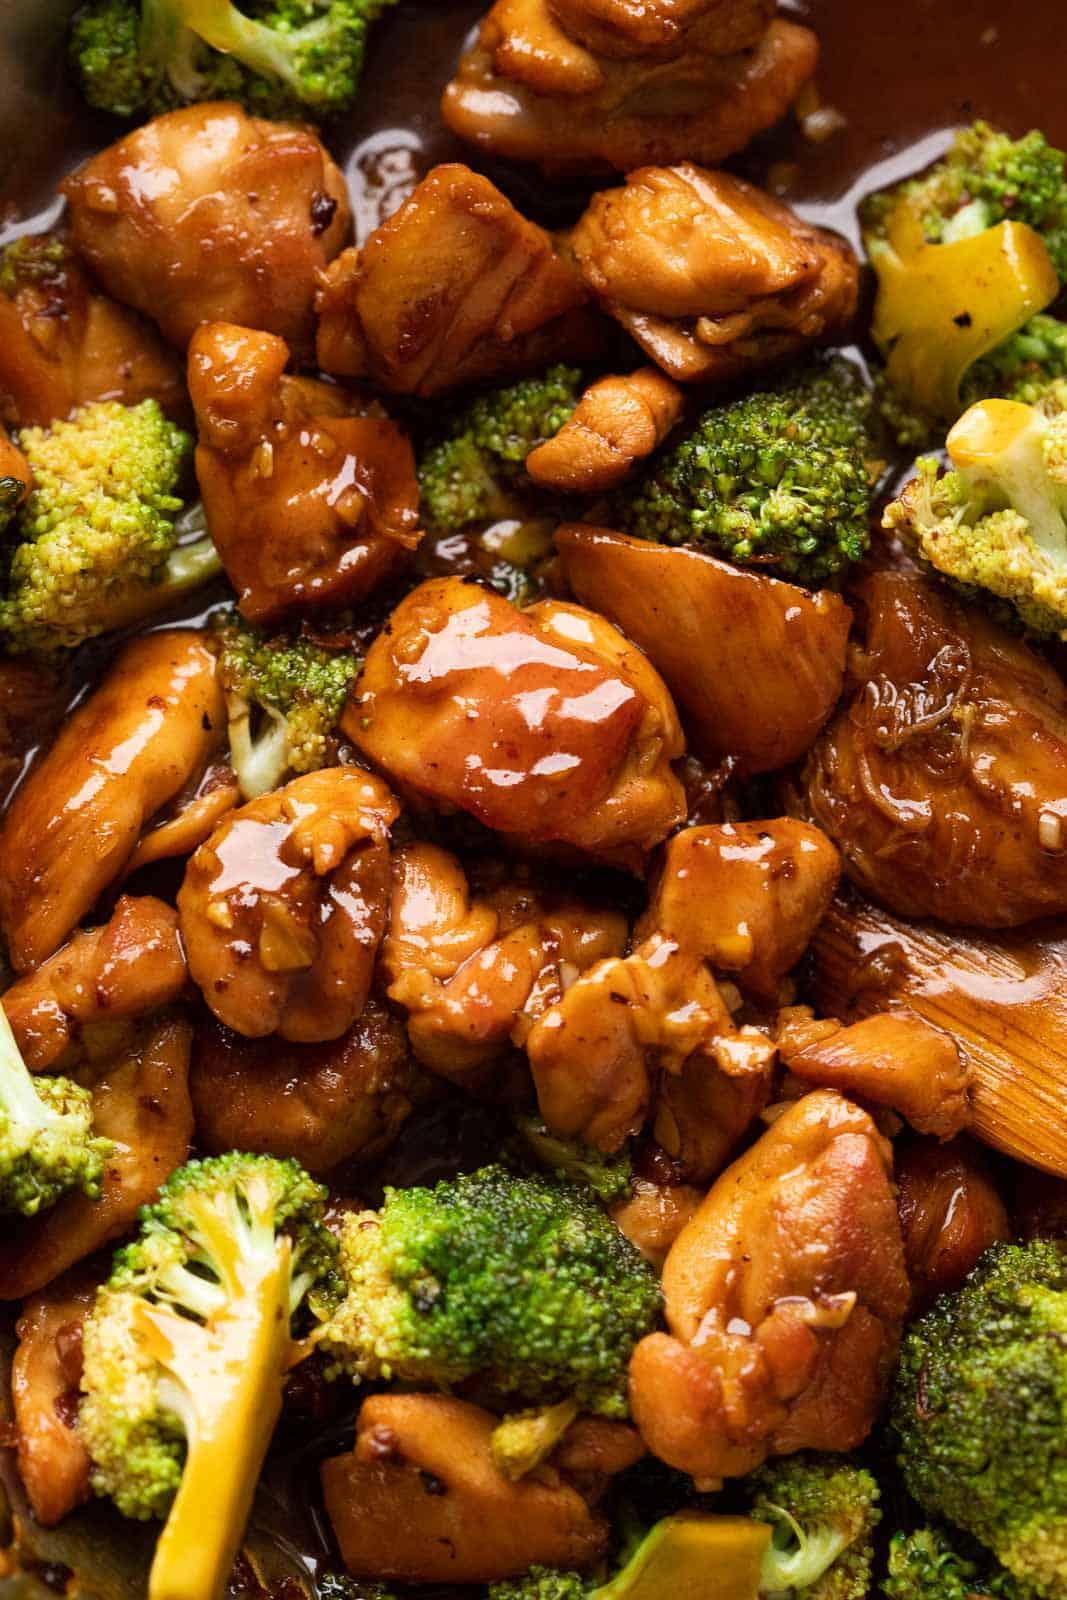 Easy Teriyaki Chicken with Broccoli